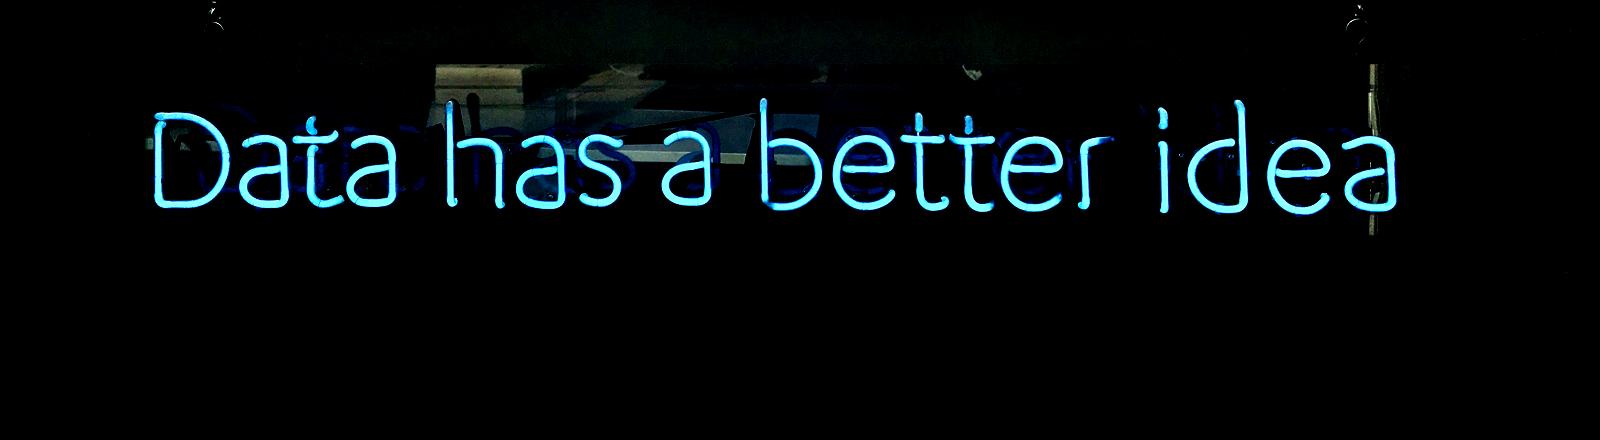 Eine Neonleuchtschrift: Data has a better idea